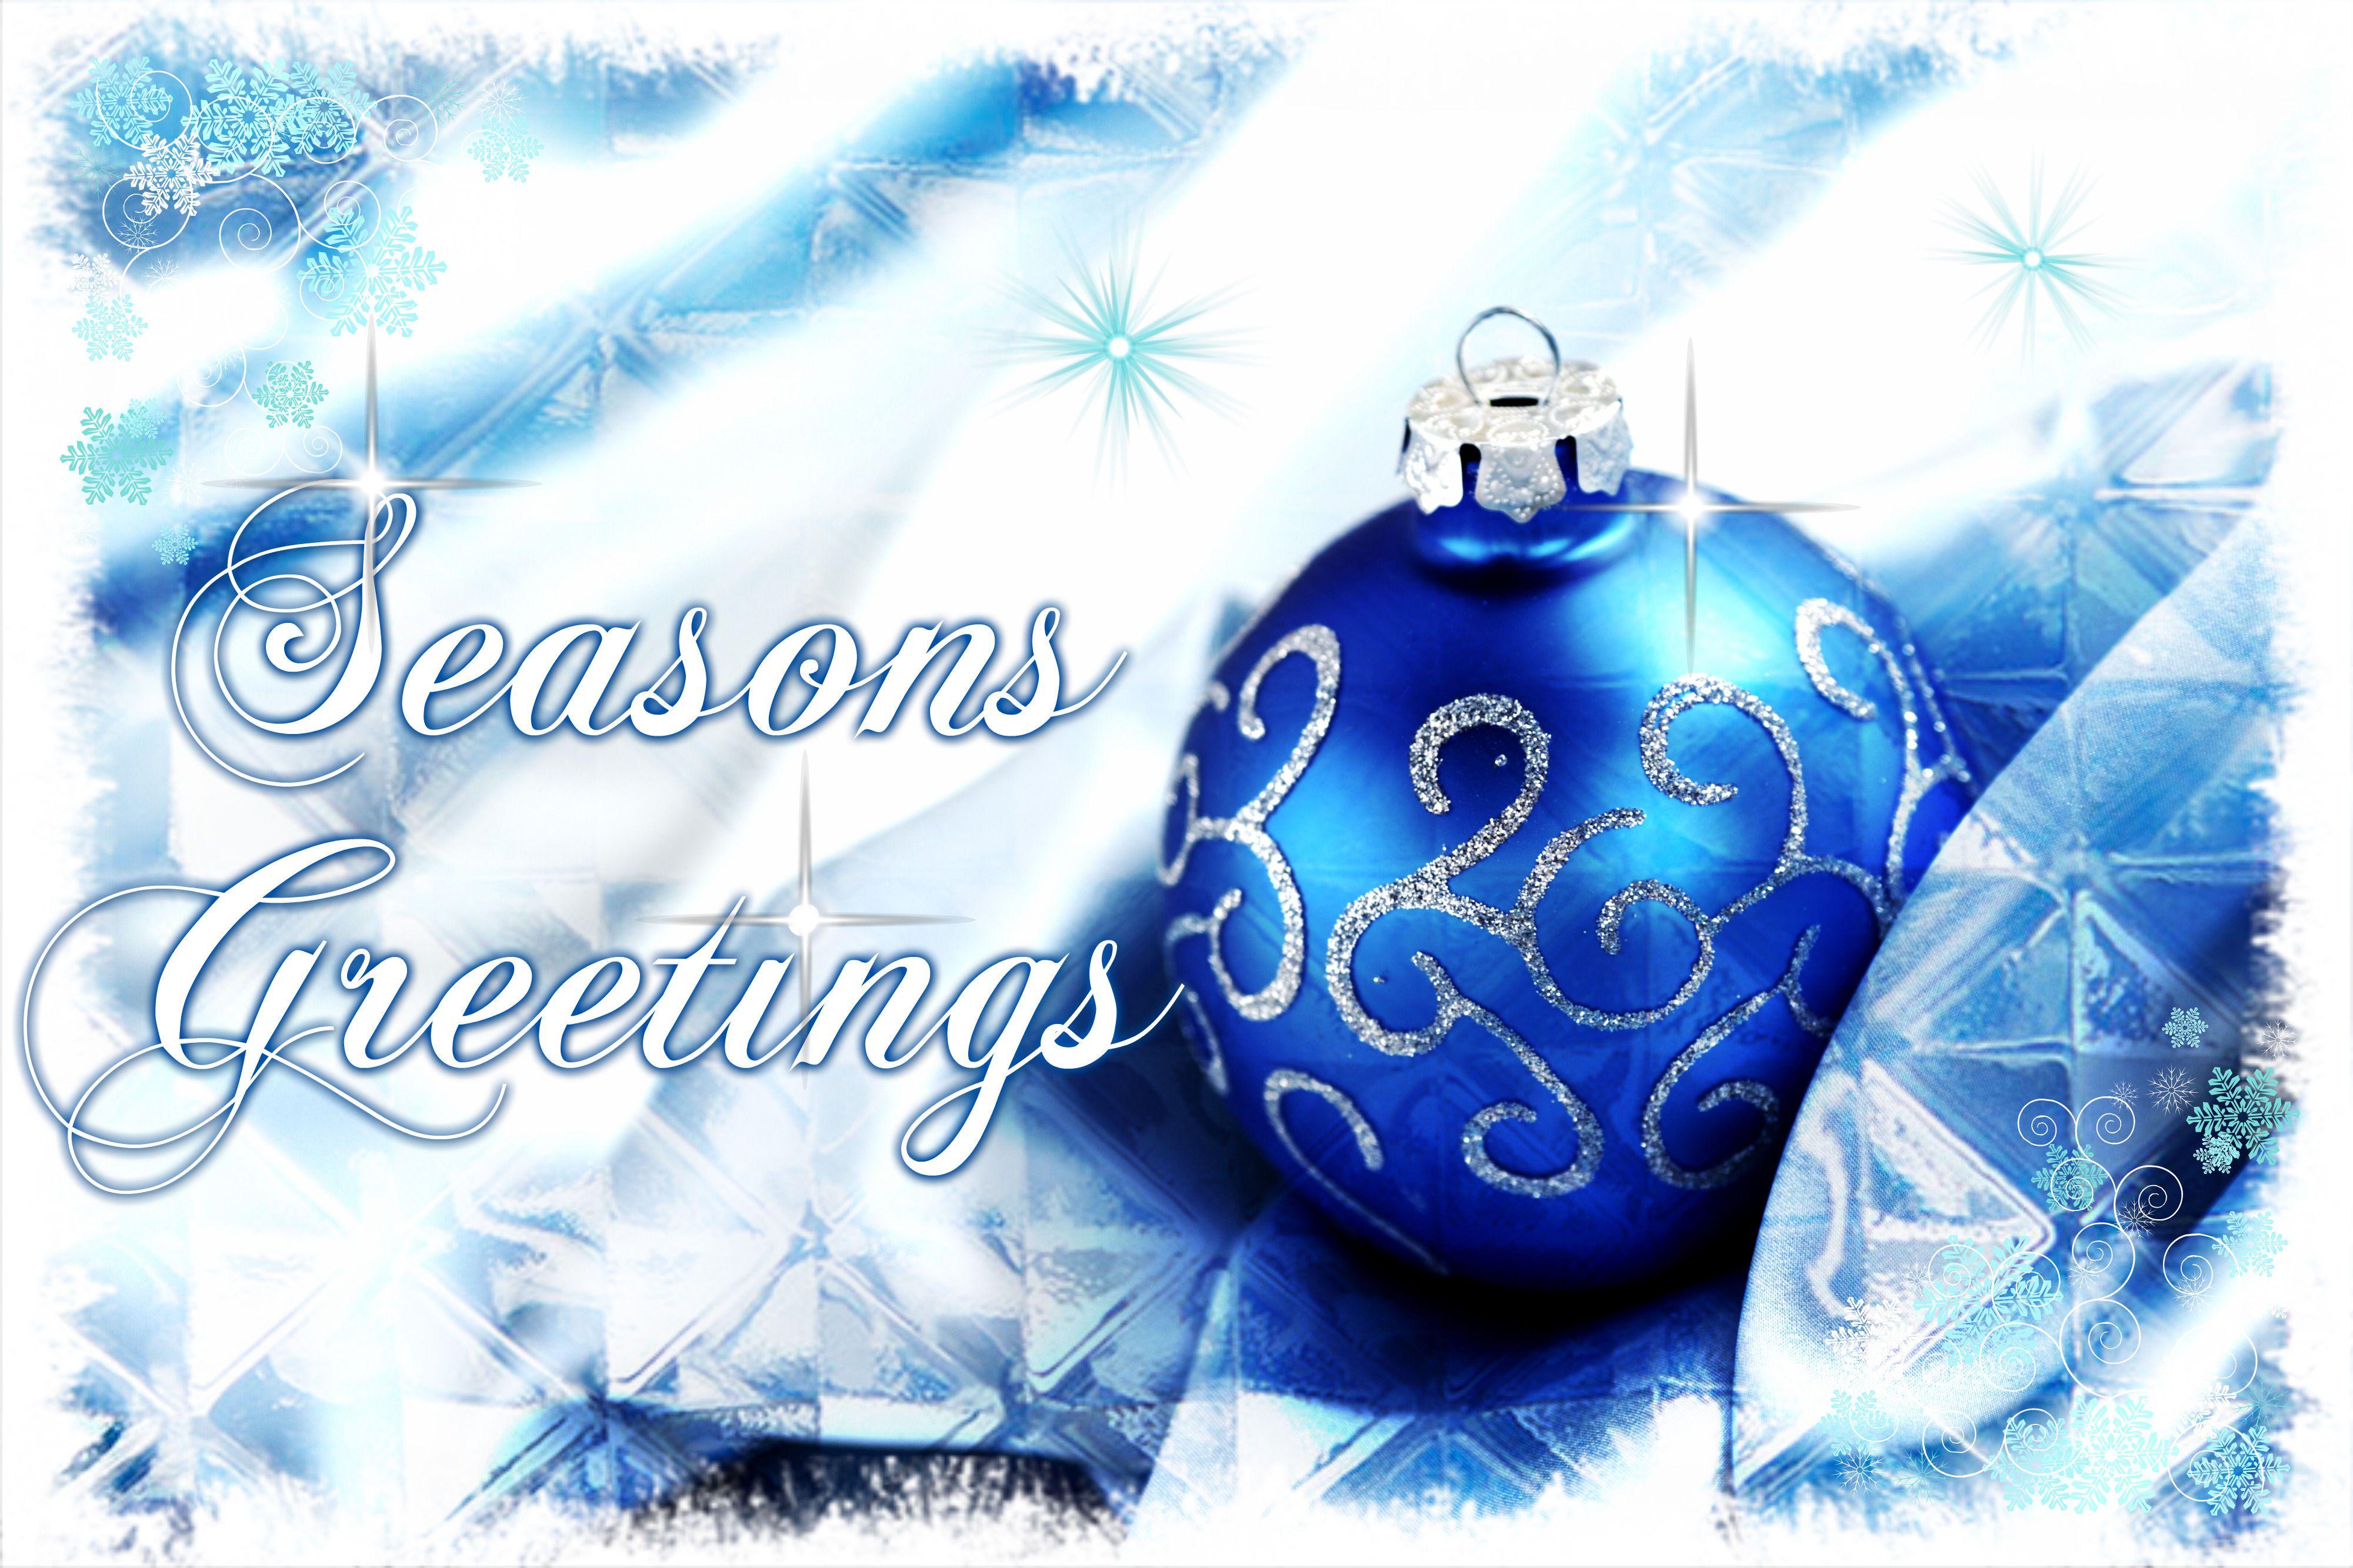 Seasons greetings blue holiday silver christmas ornament christmas seasons greetings blue holiday silver christmas ornament christmas quotes noel seasons greetings m4hsunfo